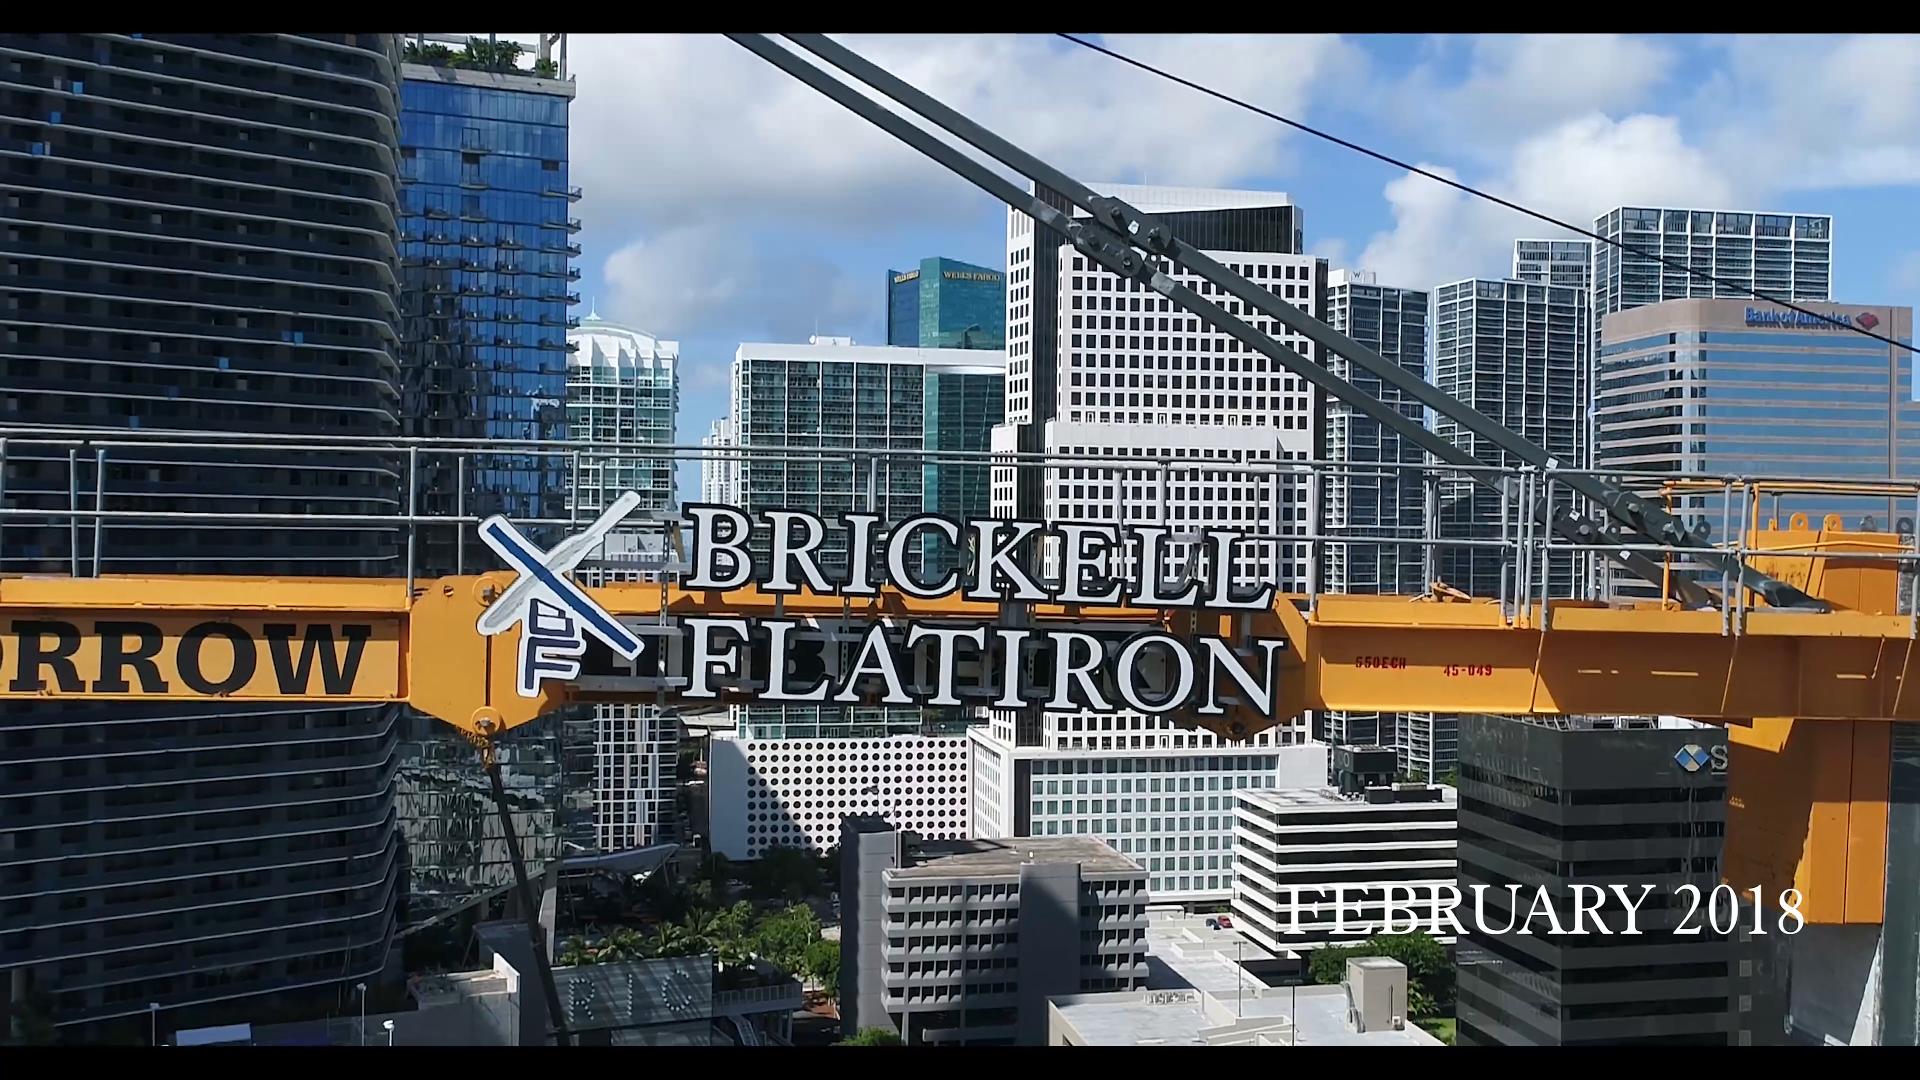 Brickell Flatiron Condos